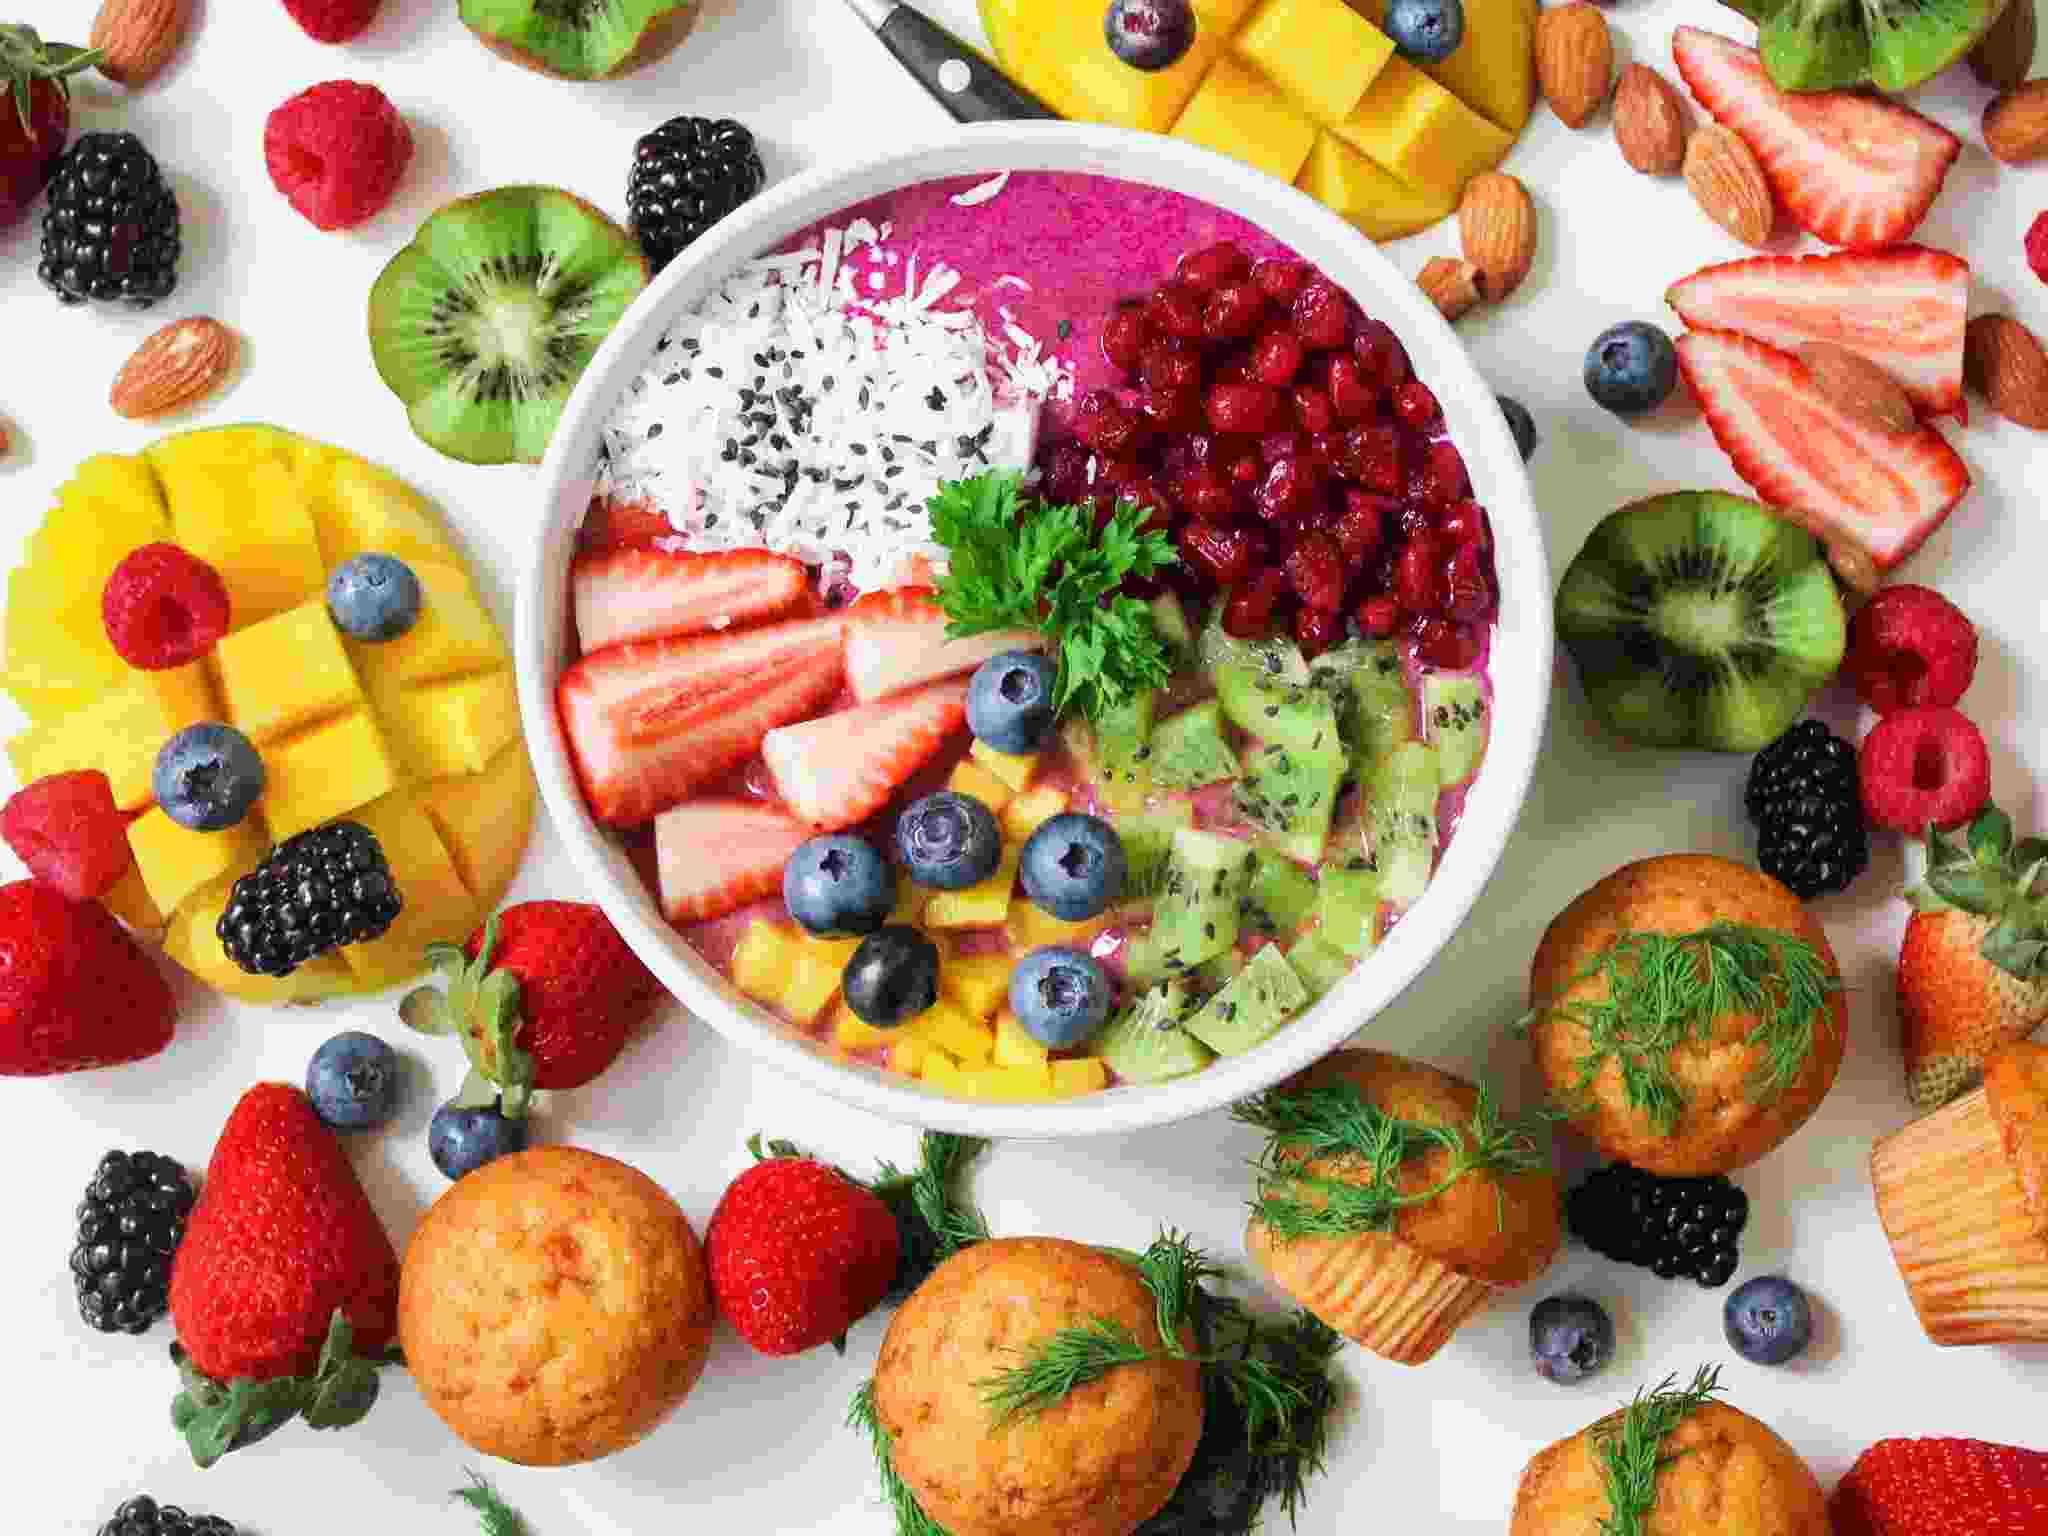 A boul full of healthy vegs